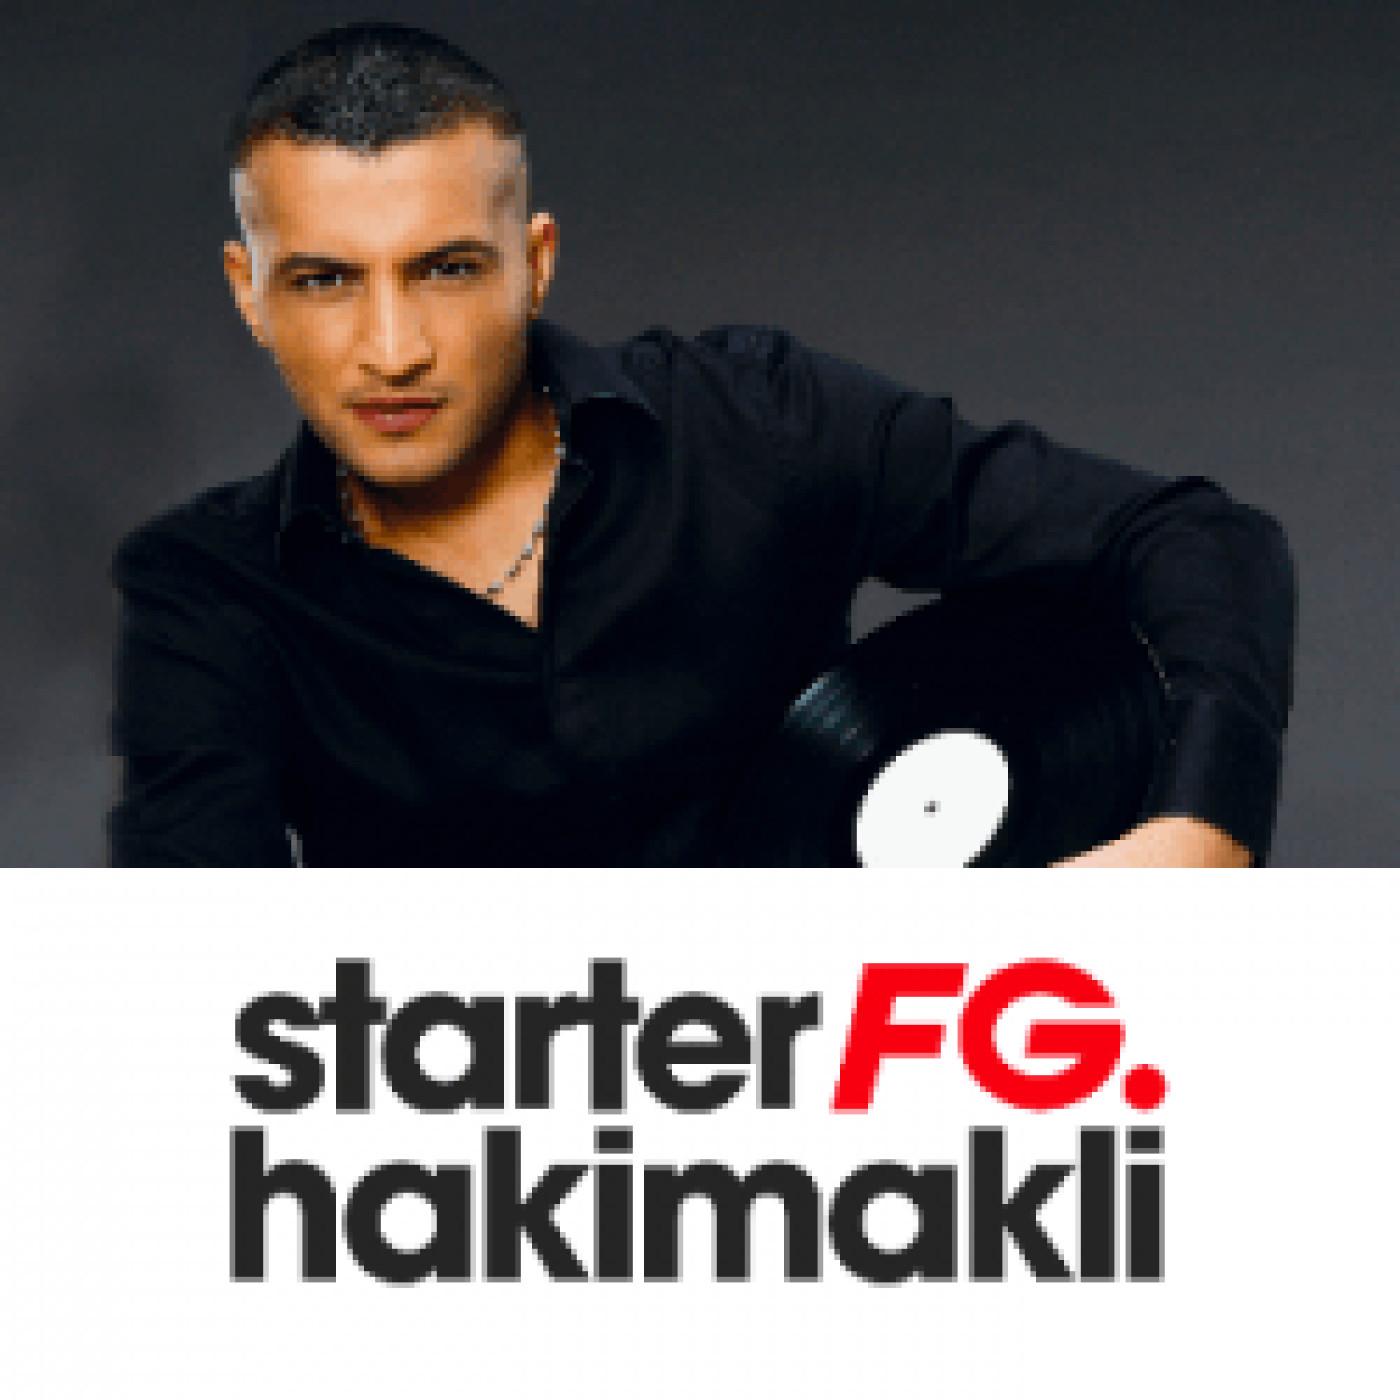 STARTER FG BY HAKIMAKLI JEUDI 10 DECEMBRE 2020